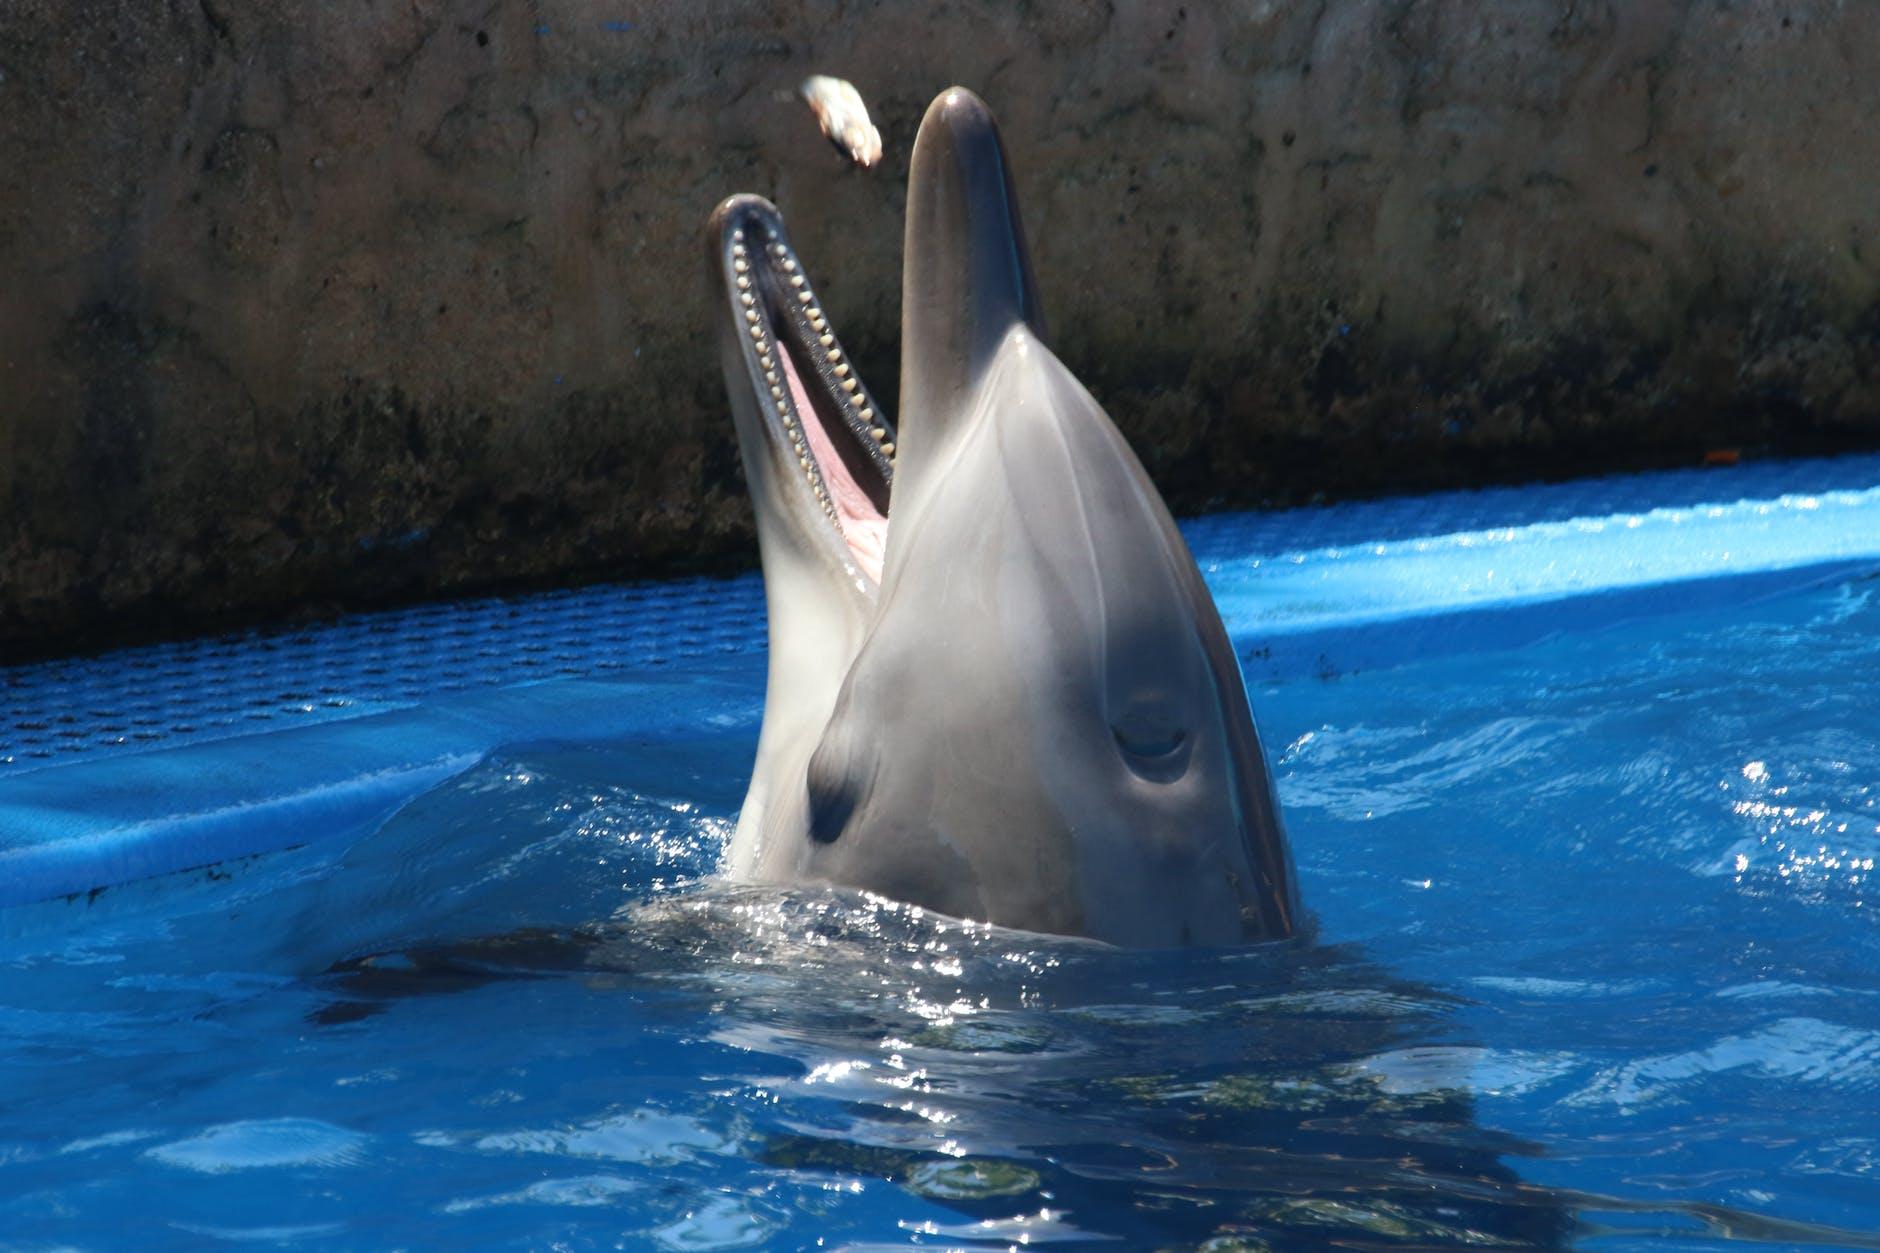 dolphin a friendly mammal